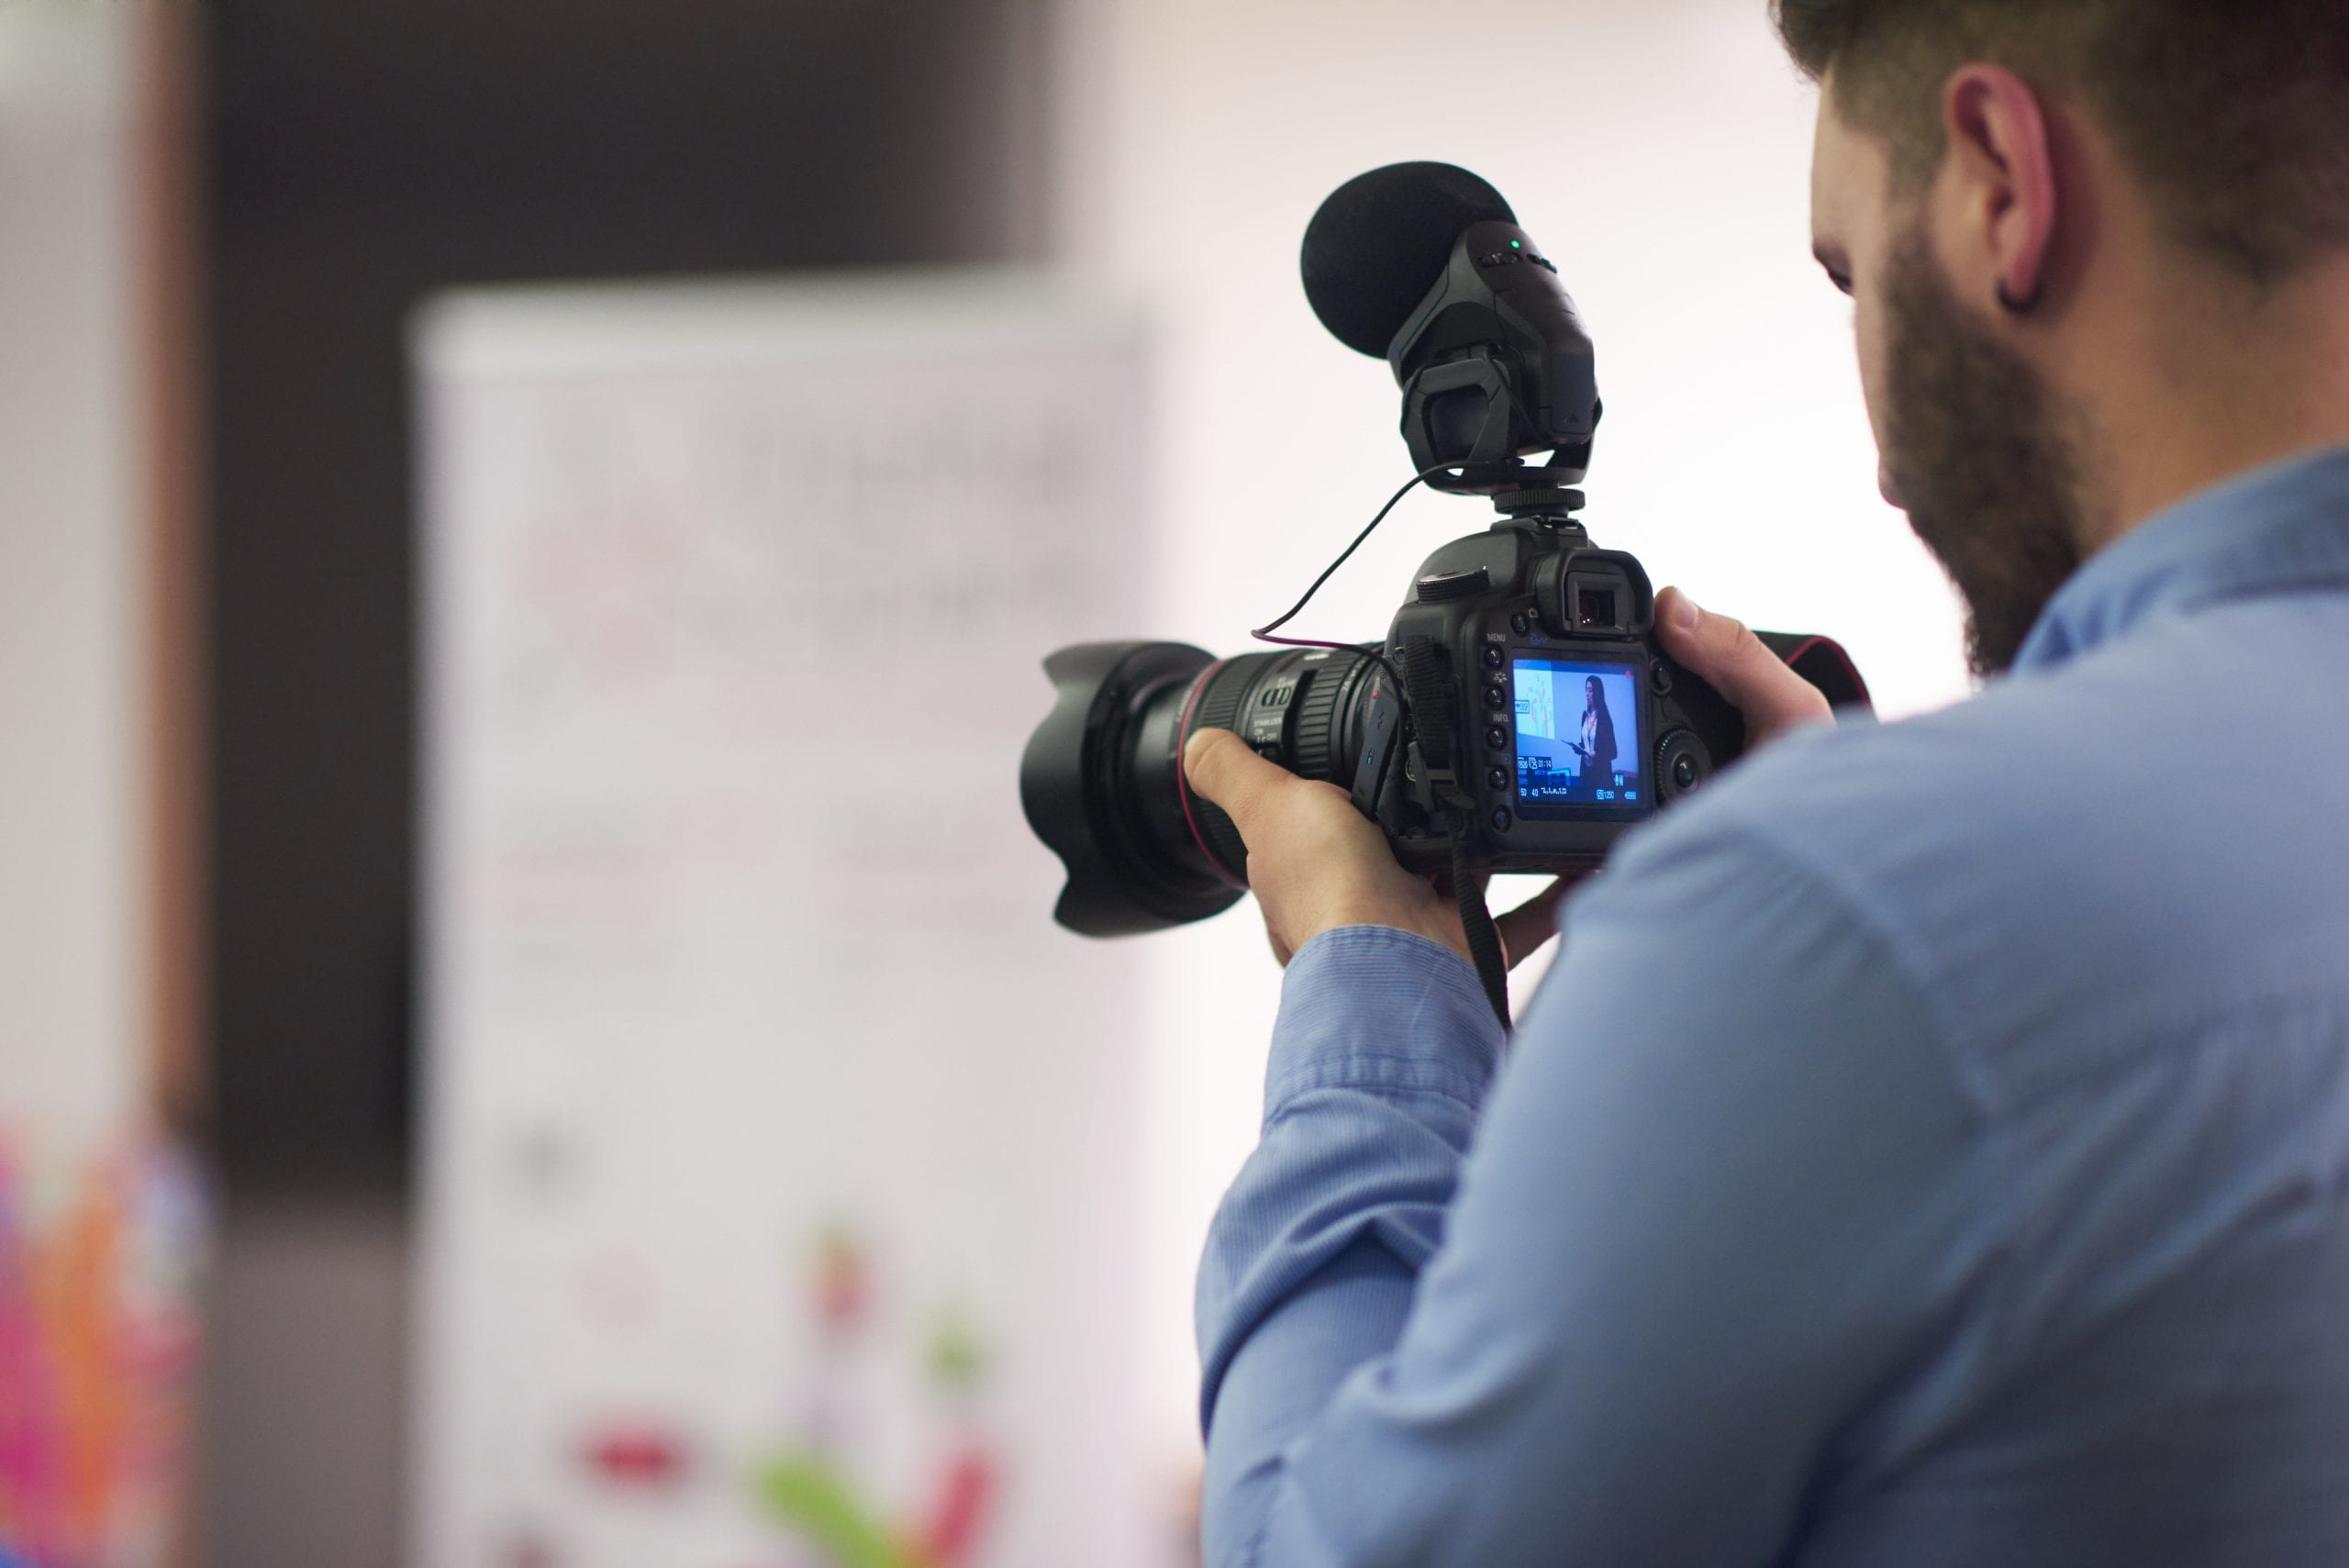 Videographer recording a show